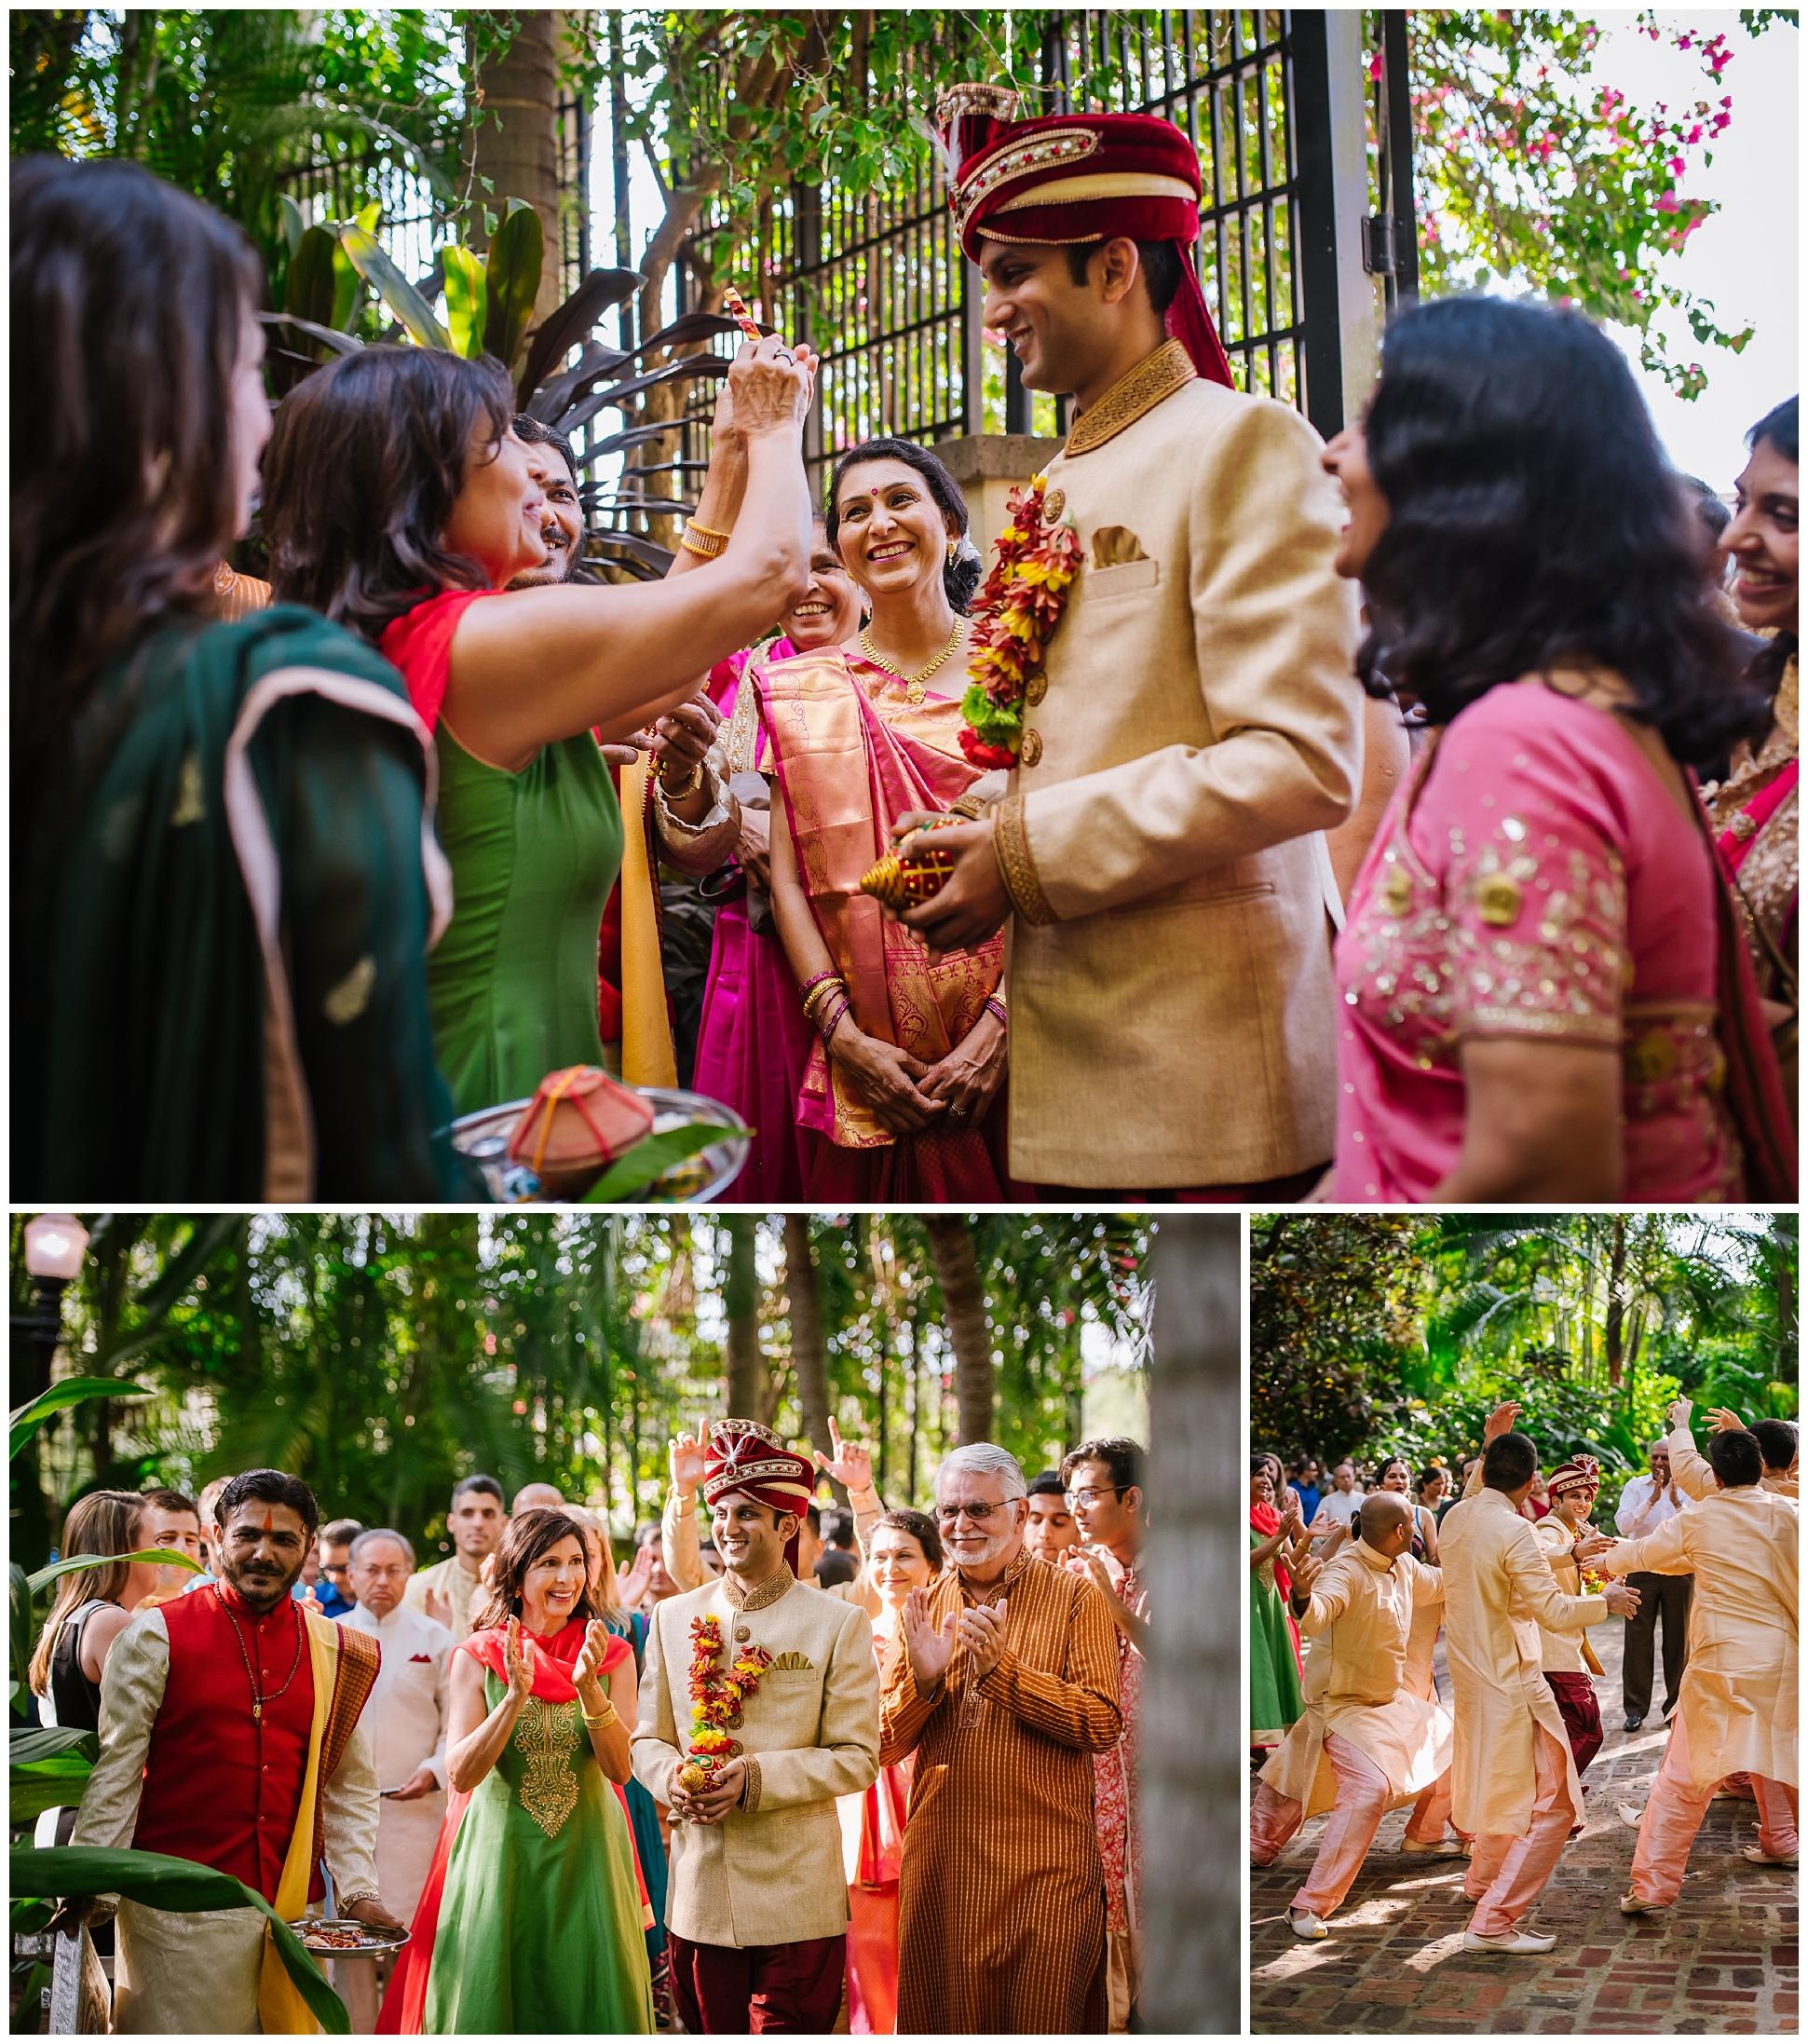 St-pete-indian-wedding-photographer-barat-sunken-gardens_0094.jpg